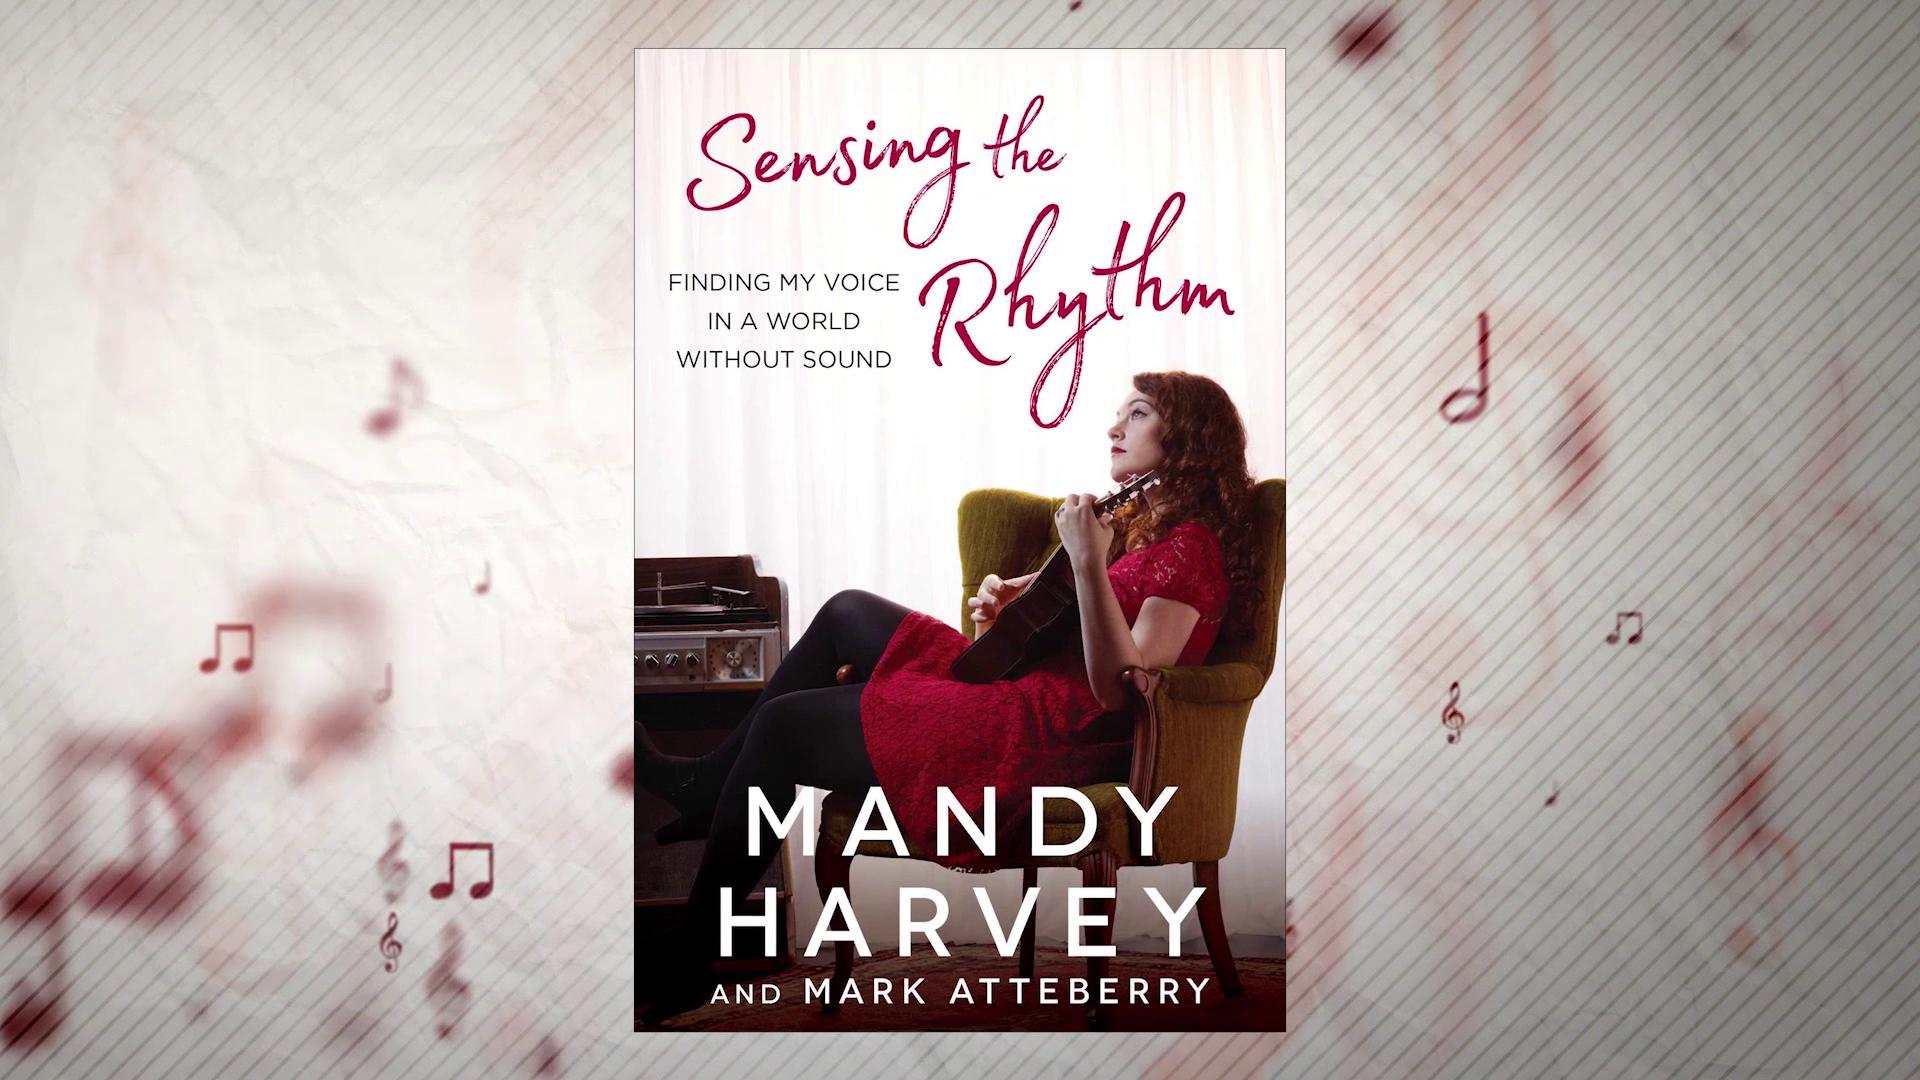 Mandy Harvey on SENSING THE RHYTHM